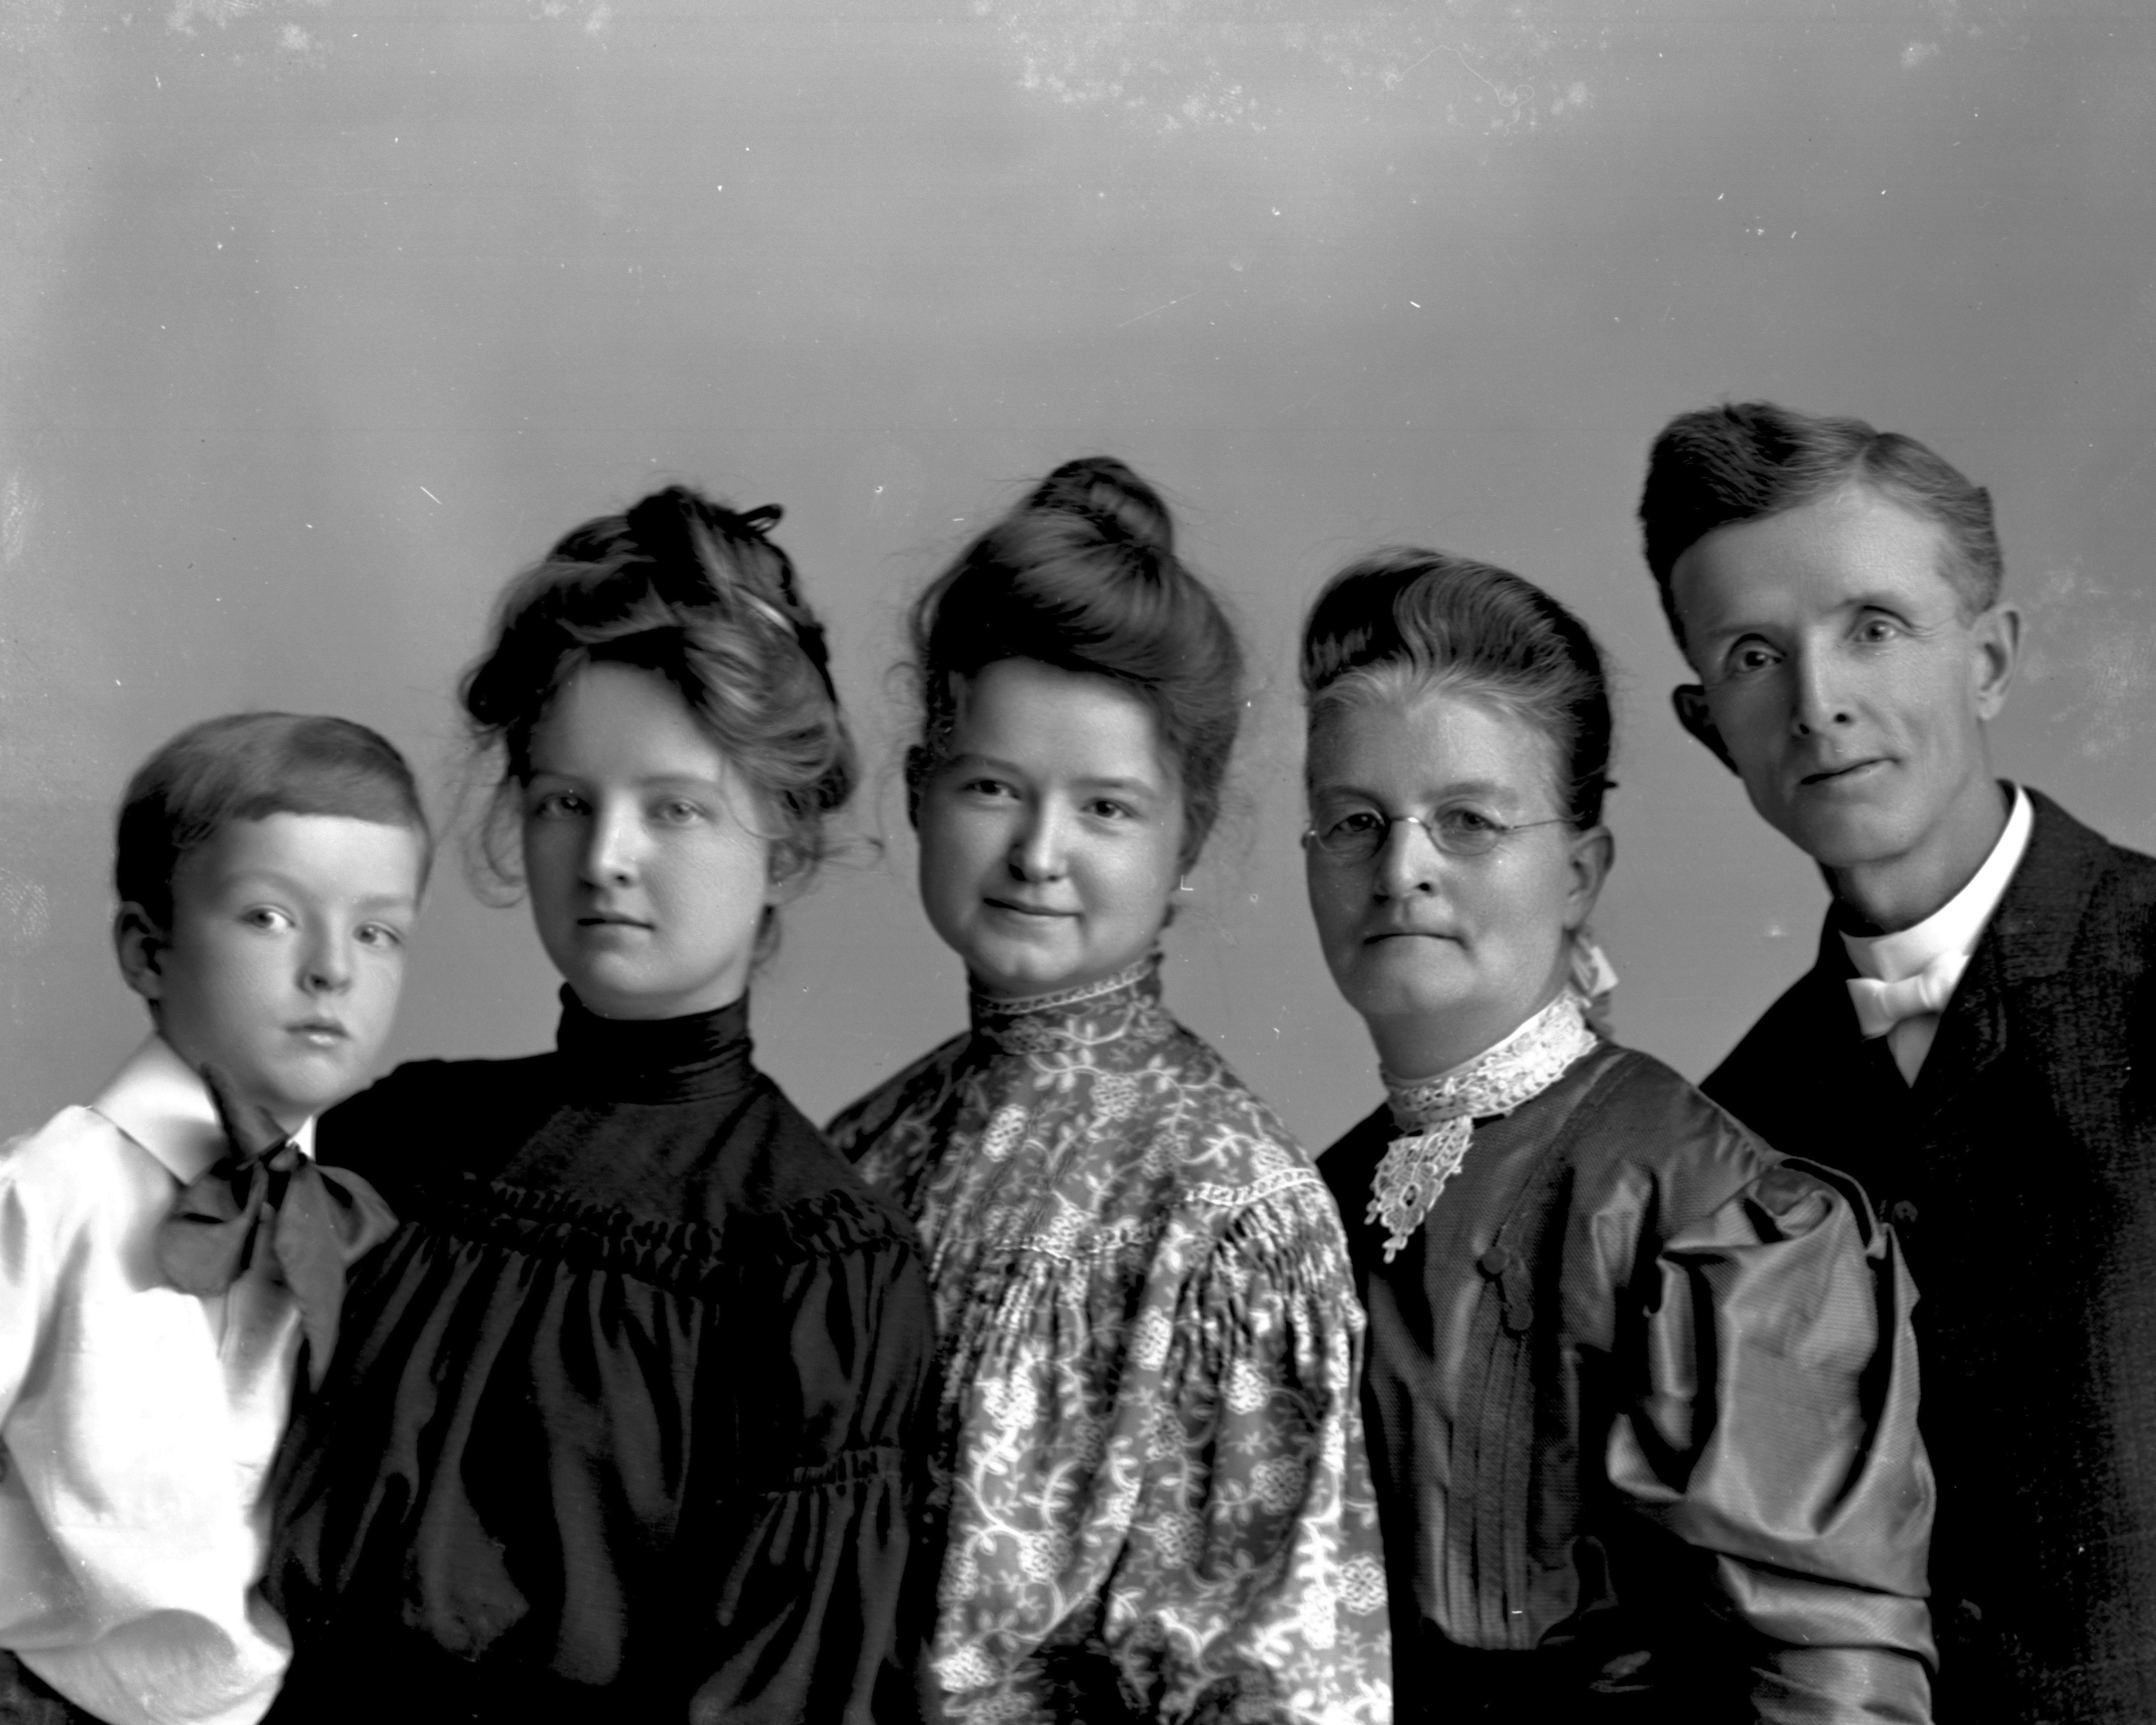 The Barrette family - George M, Mattie, Lydia, Ada & George, Jr. - ca. 1900. Photographed by J. B. Hostetler, Davenport, Iowa